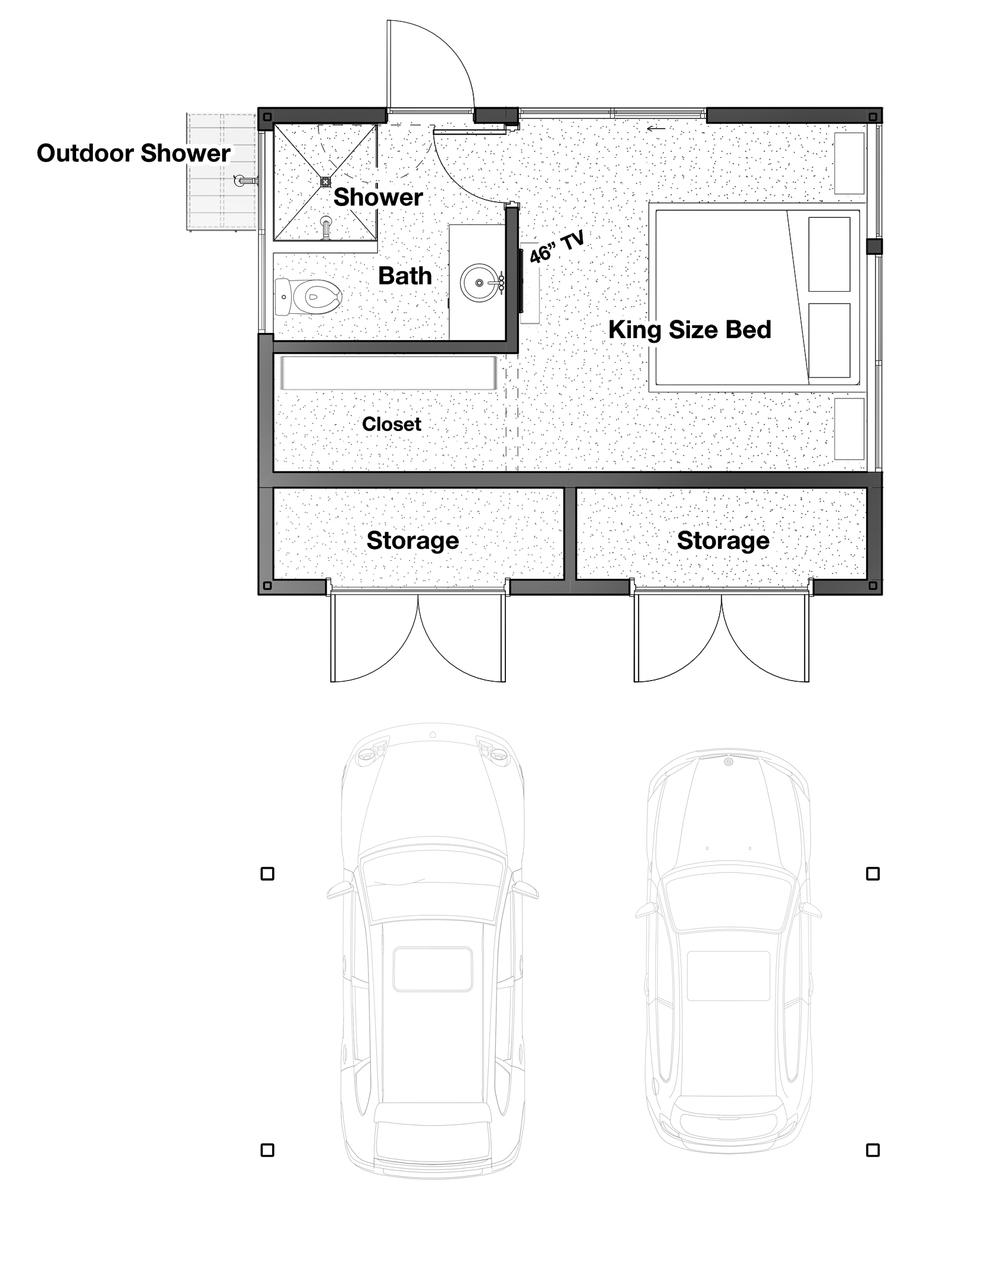 Homestead Modern No Information - Casita travel trailers floor plans